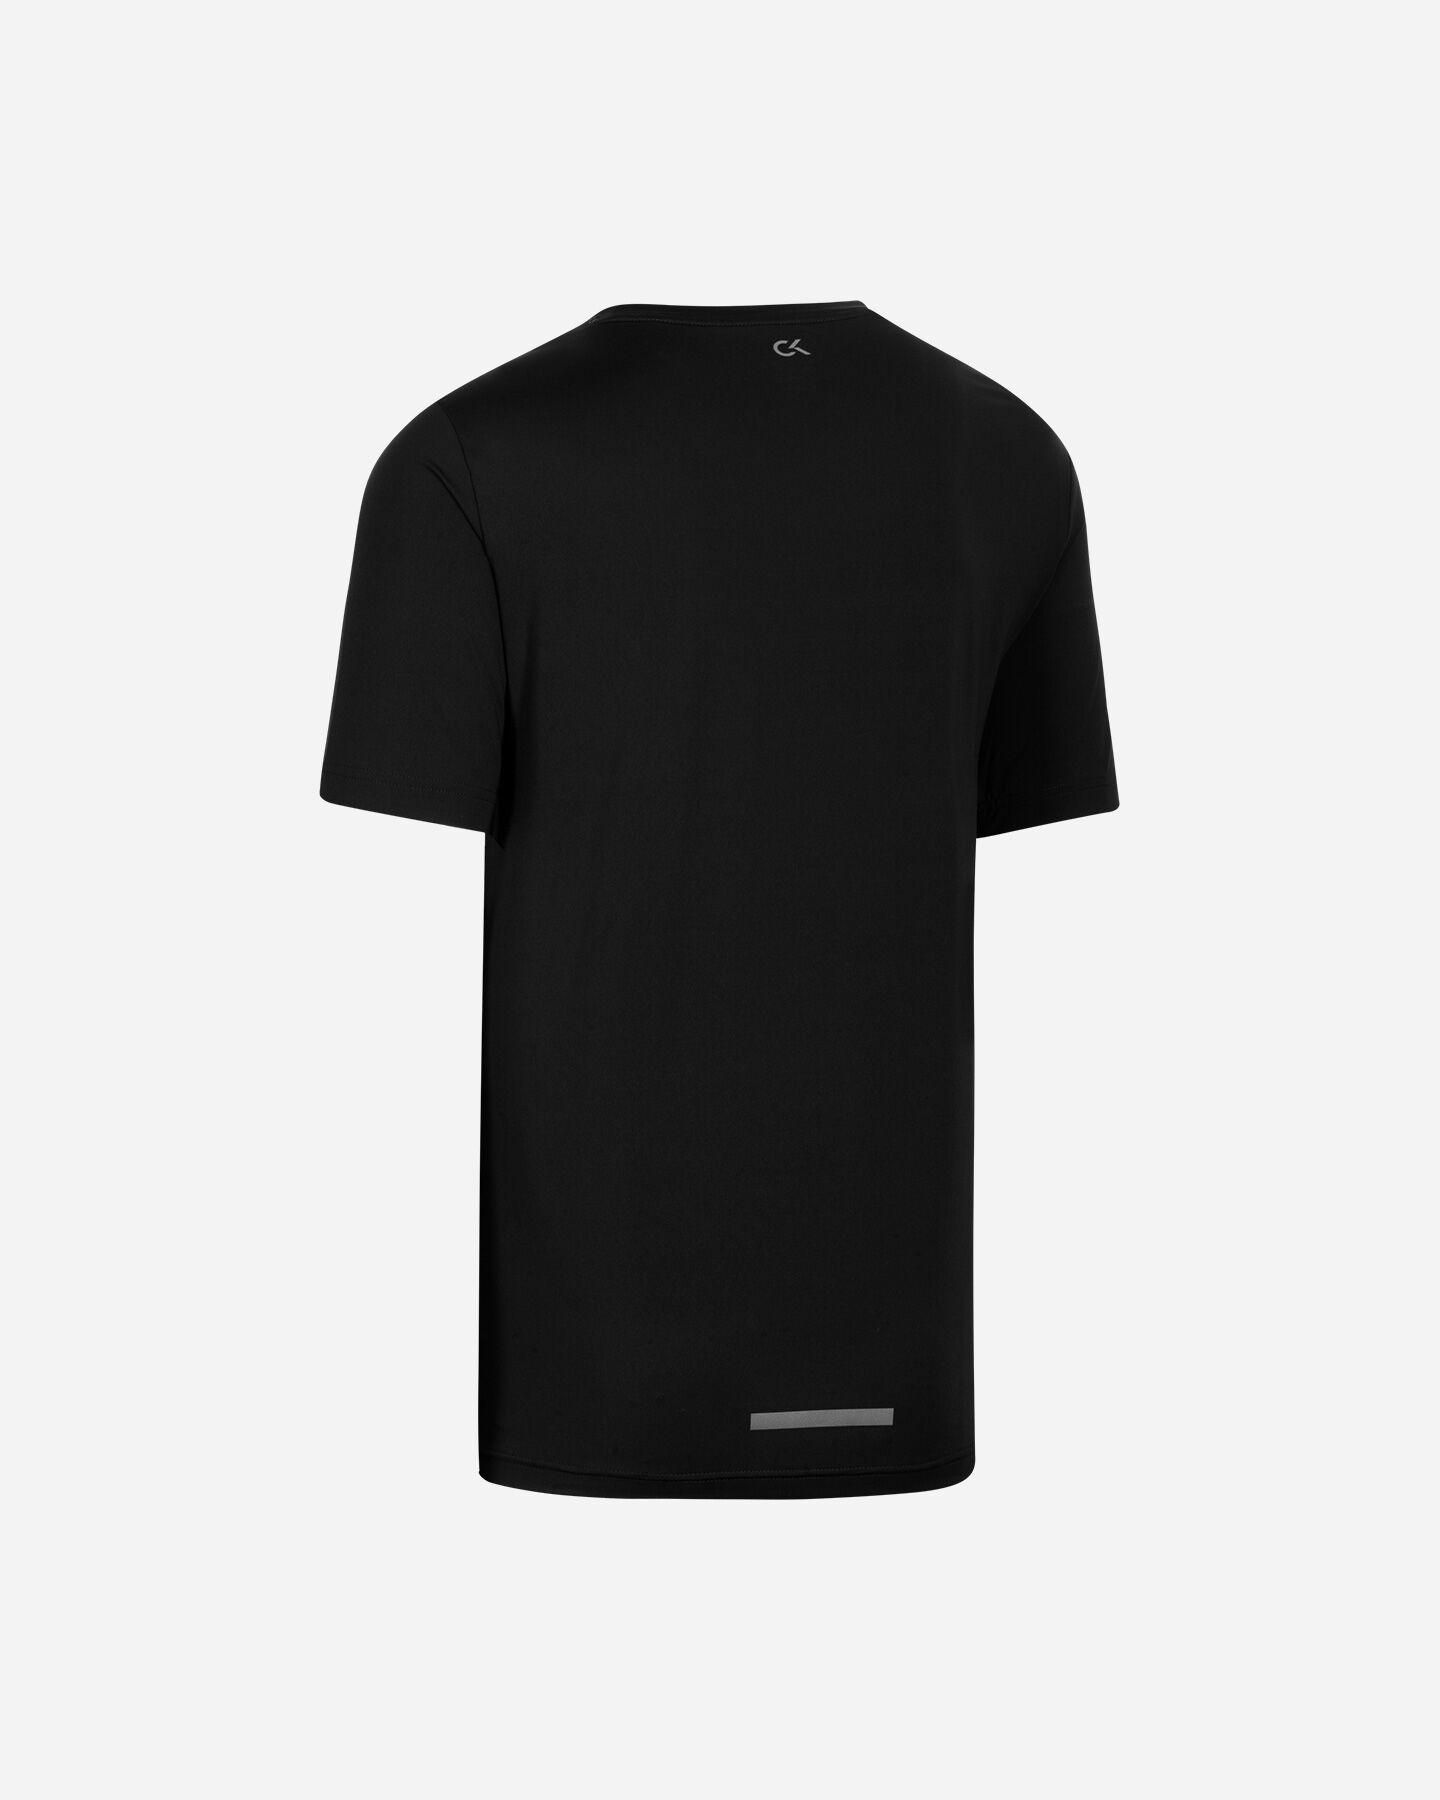 T-Shirt CALVIN KLEIN ACTIVE WORKOUT M S4079658 scatto 1